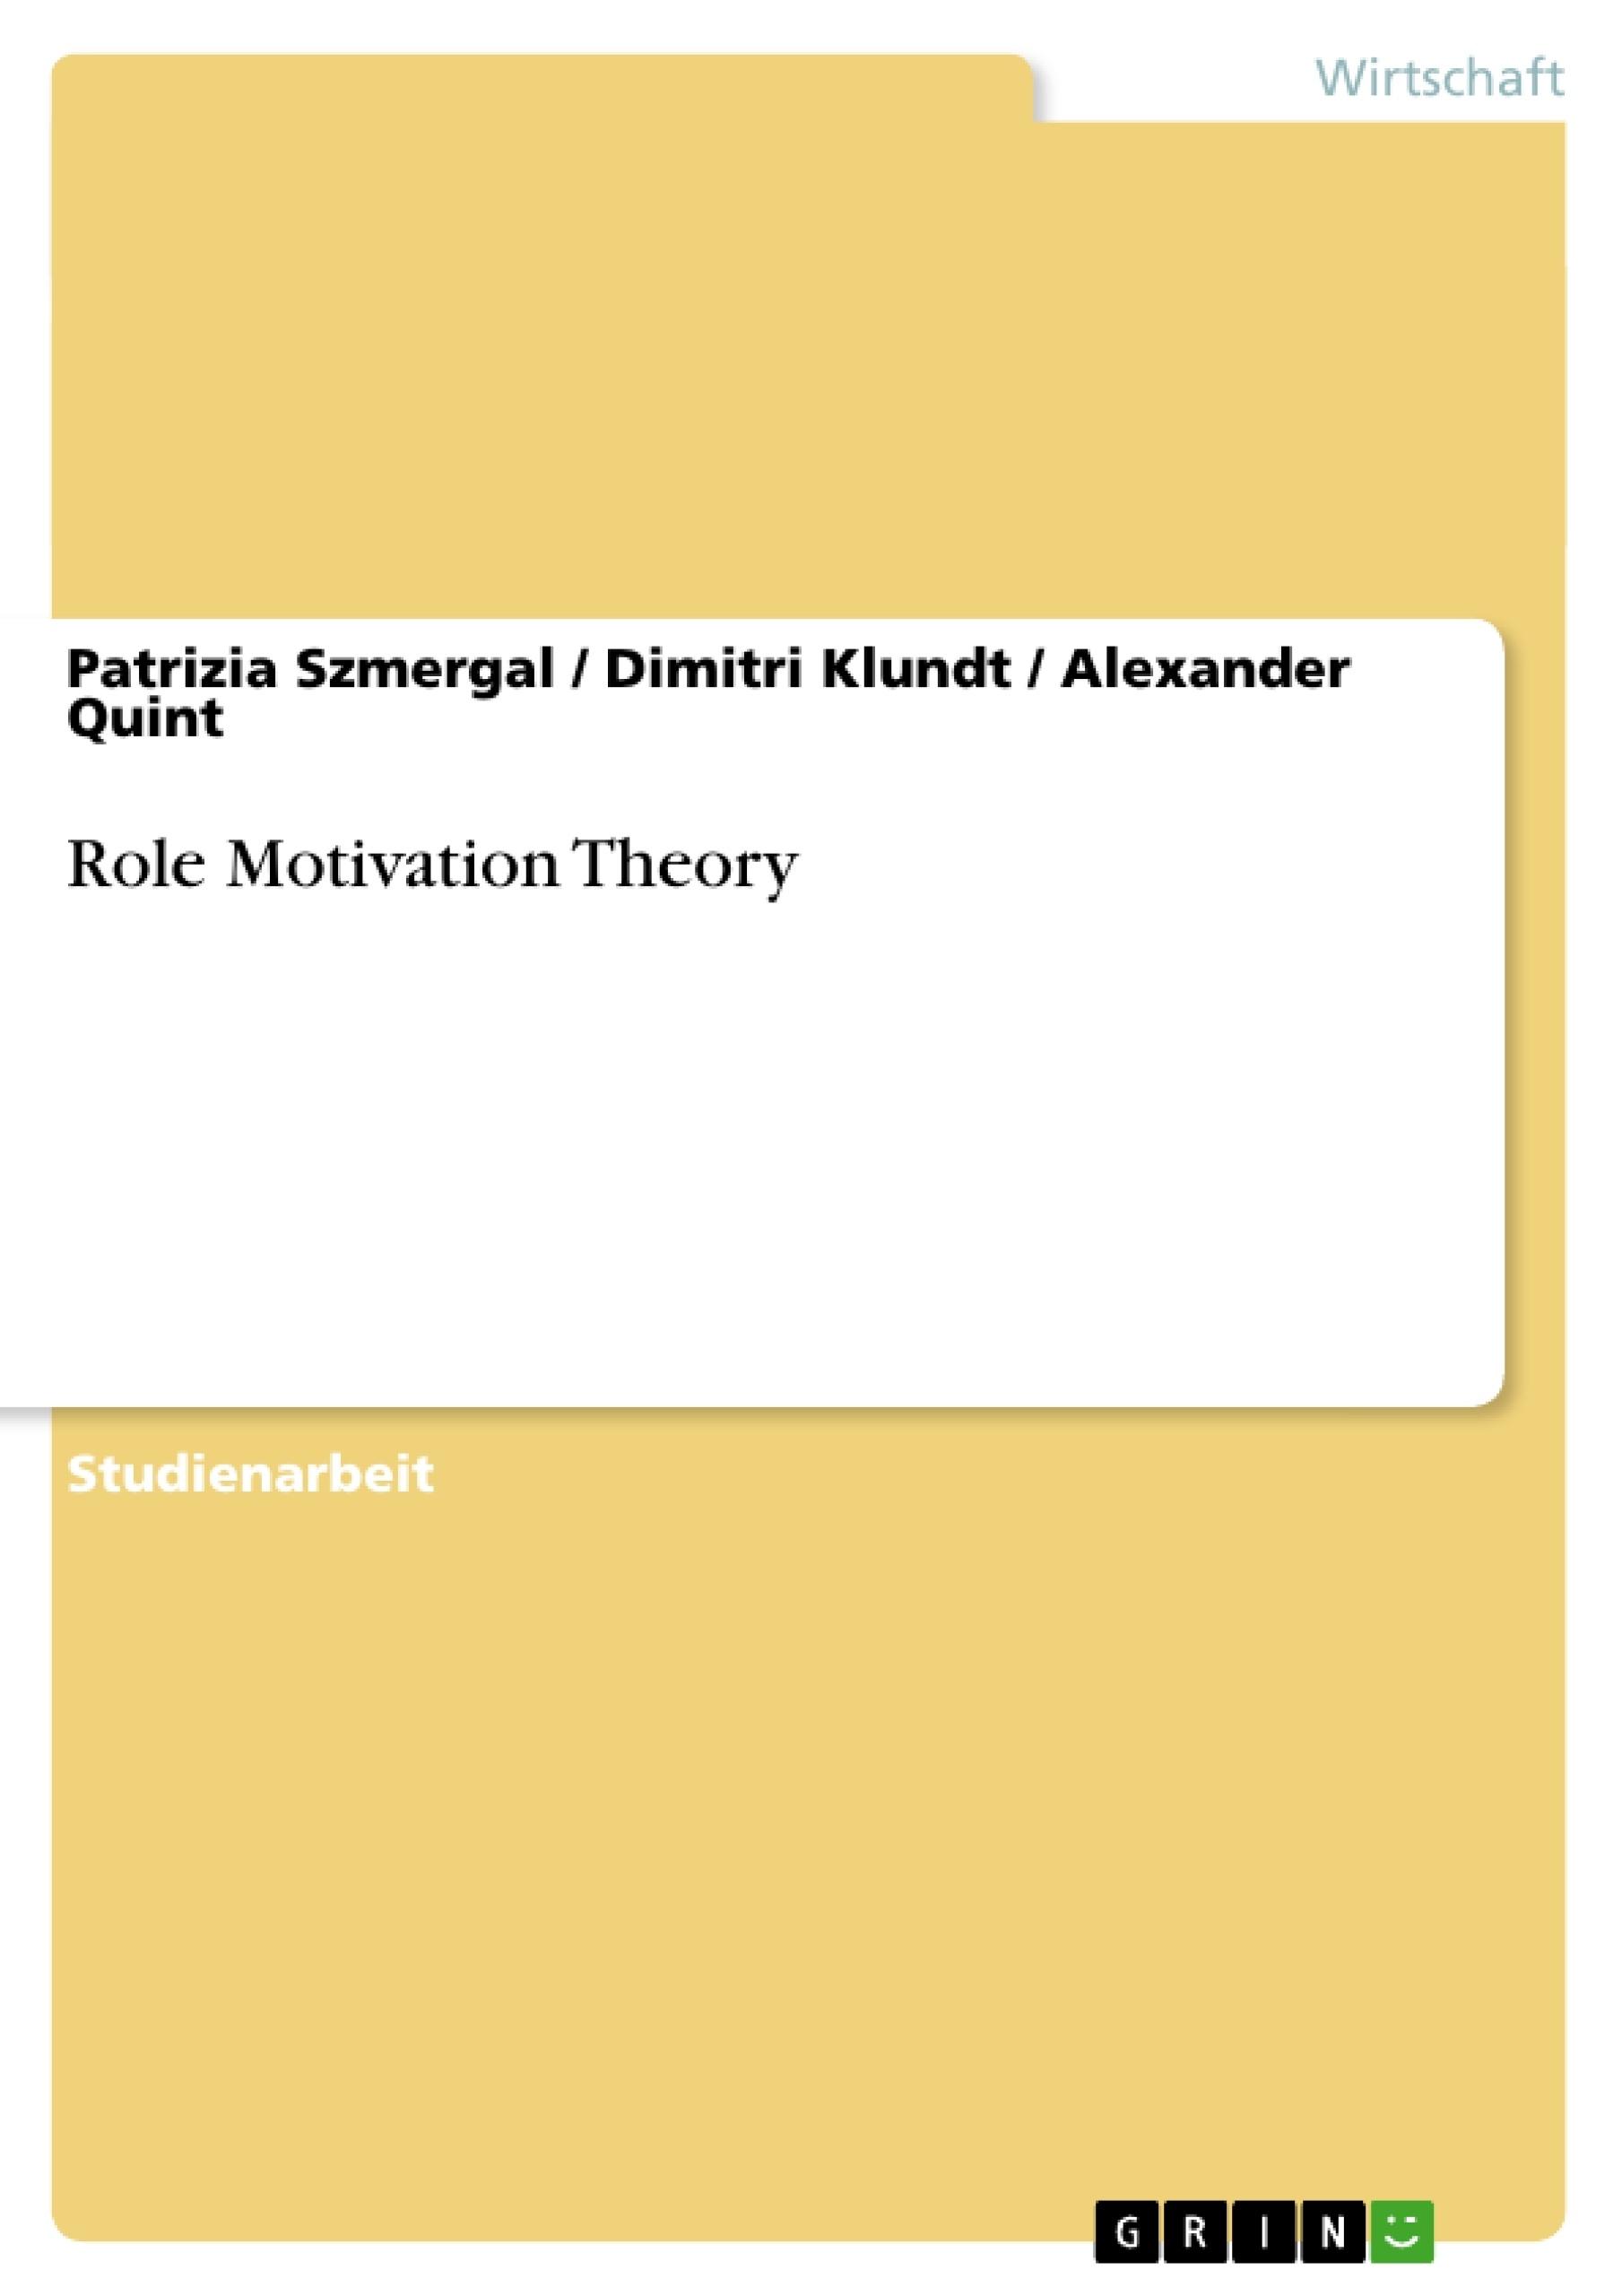 Titel: Role Motivation Theory